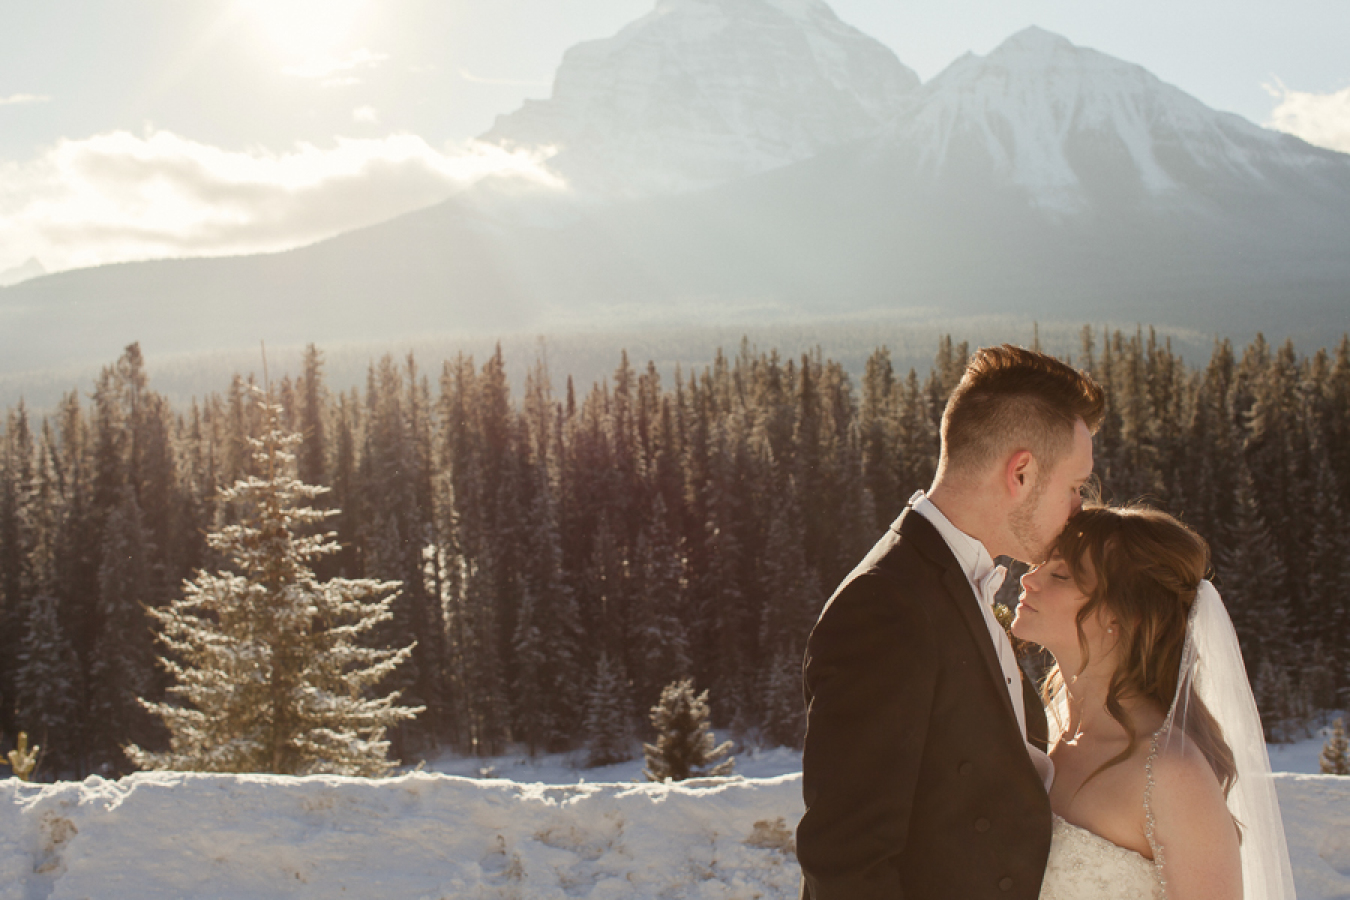 Winter Wedding Photos - Matt & Lena Photography